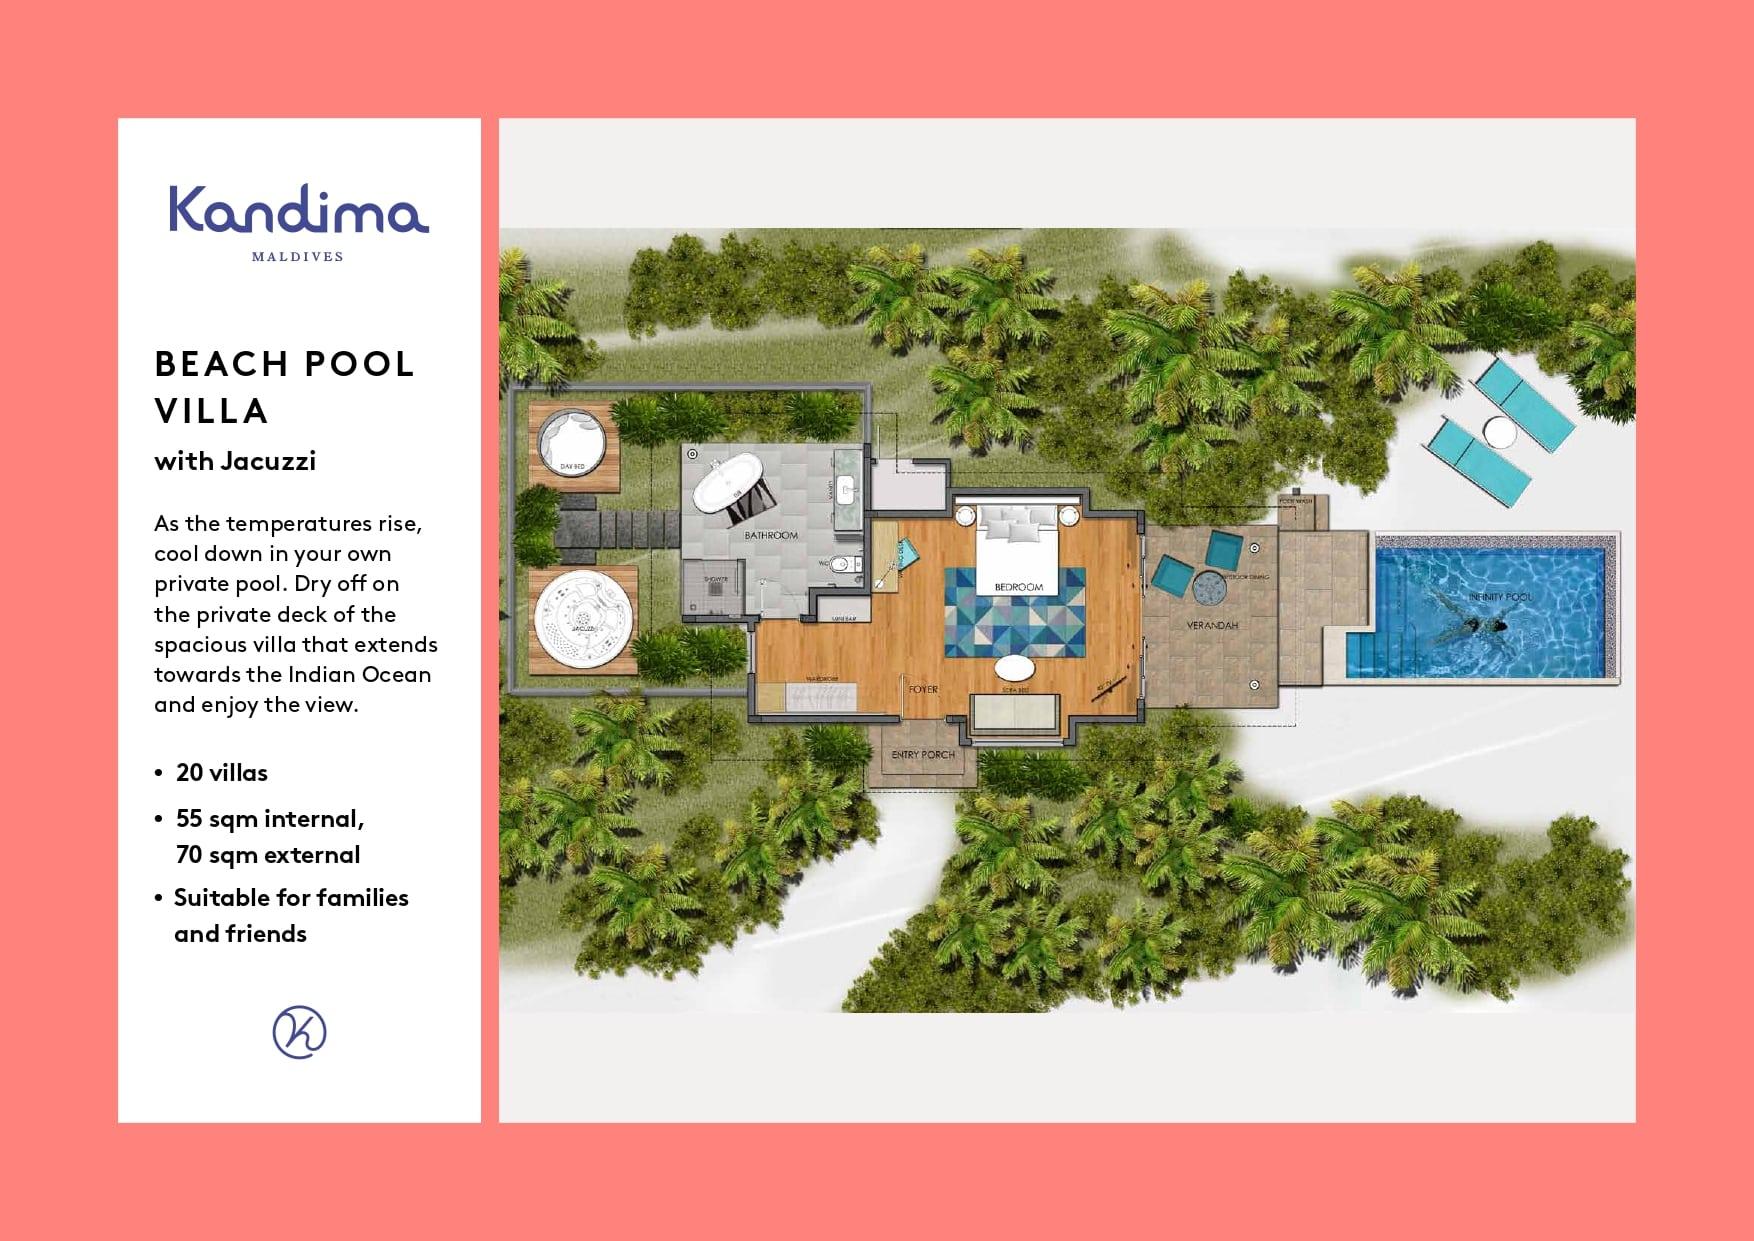 Мальдивы, отель Kandima Maldives, план-схема номера Beach Pool Villa with Jacuzzi